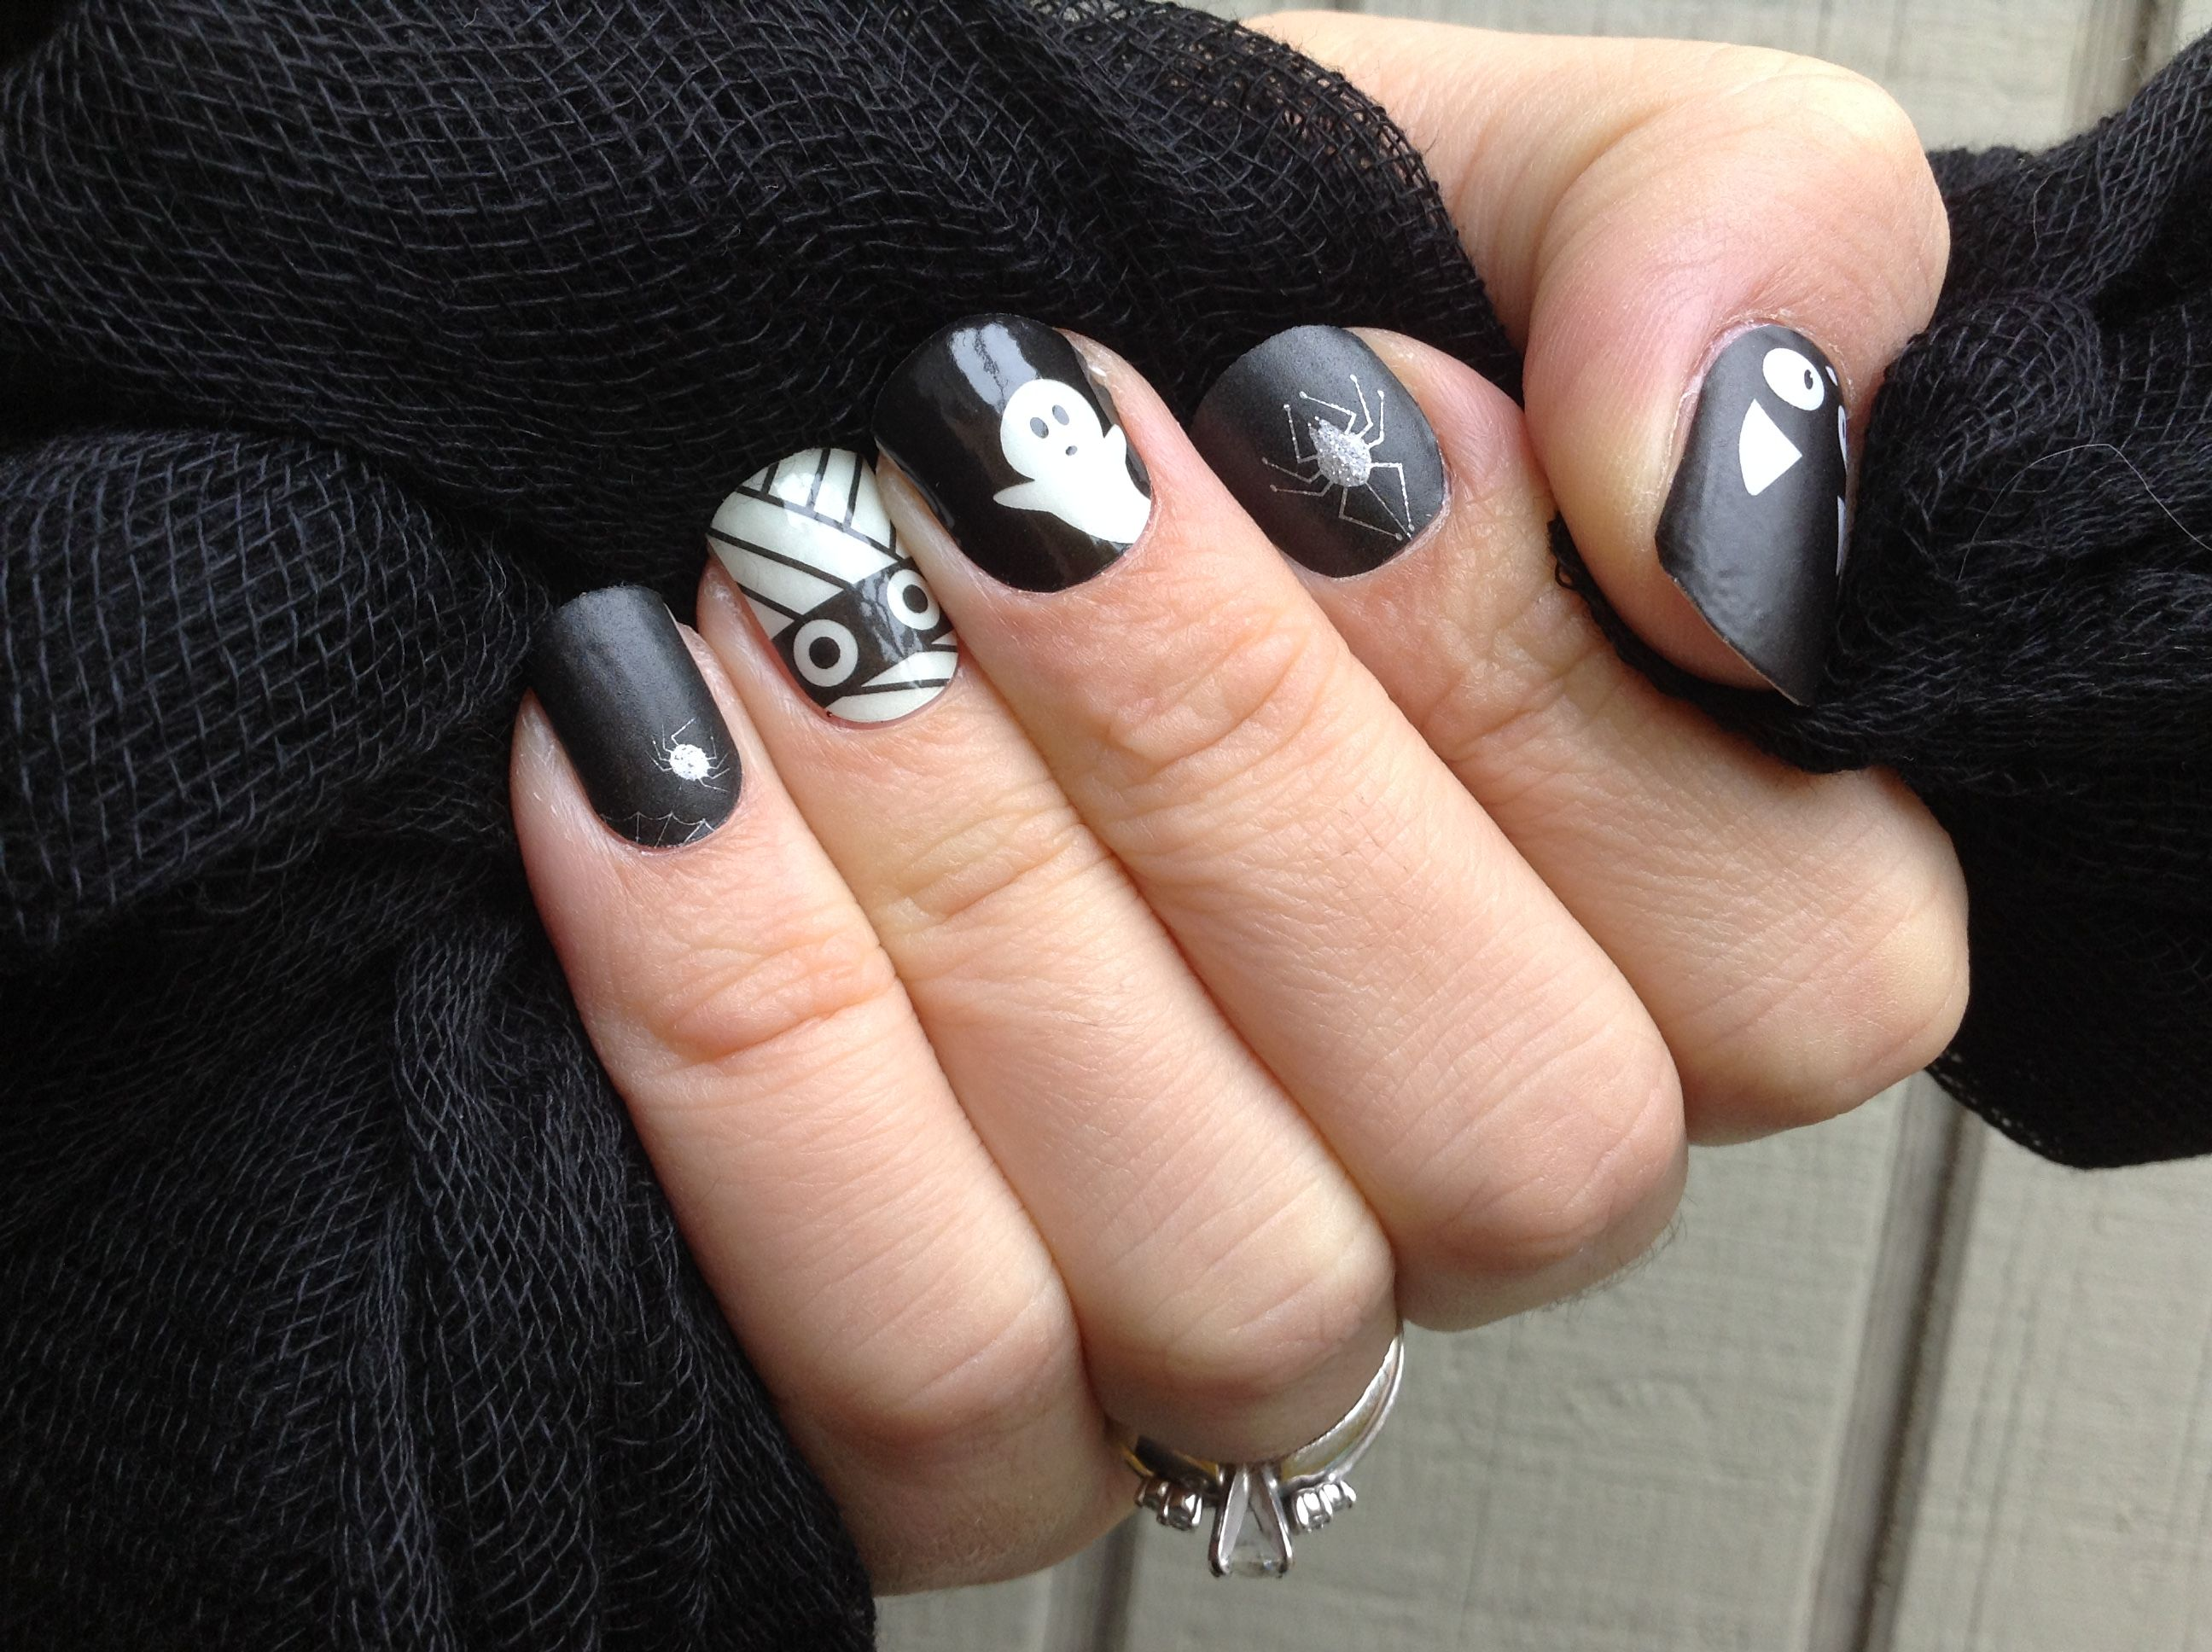 Jamberry Halloween manicure #itsybitsyjn #allwrappedupjn #ghoulyghostsjn #doubletroublejn #gabbysjams